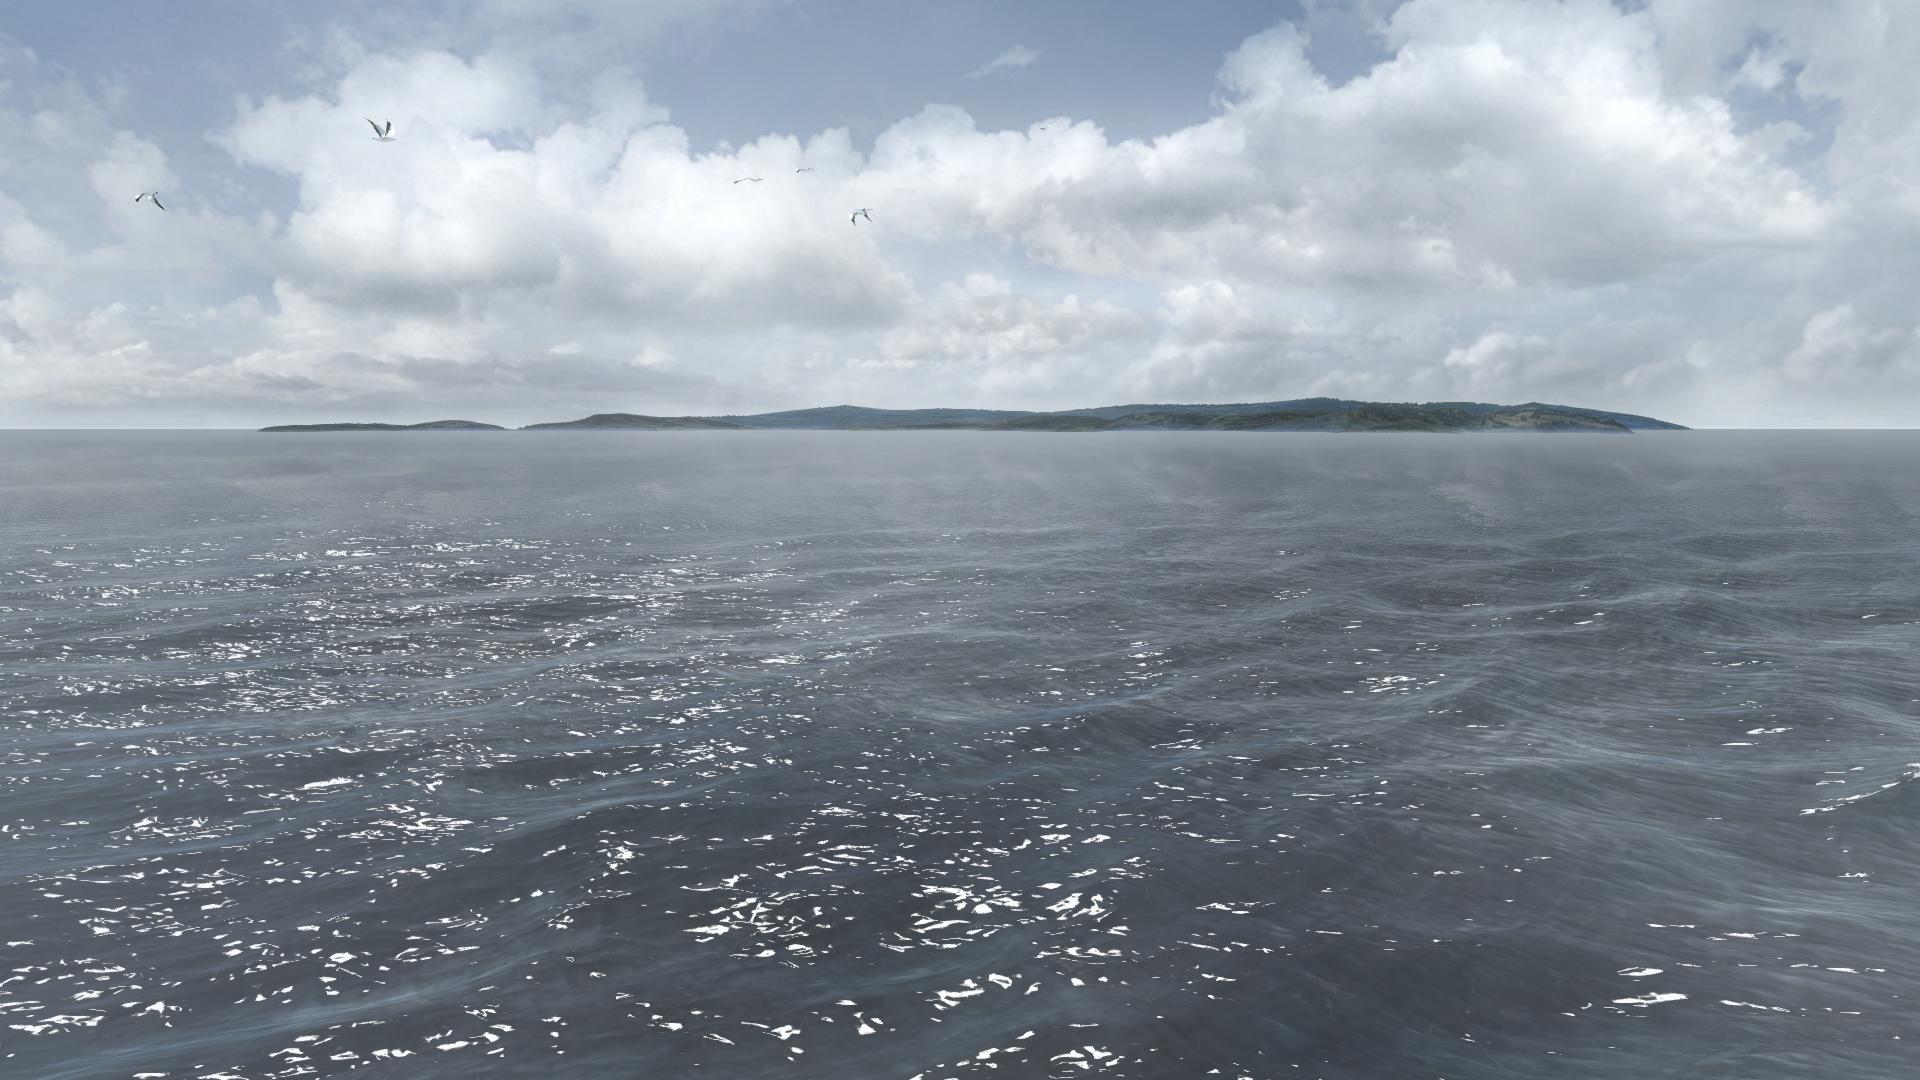 PNG Ocean - 77969